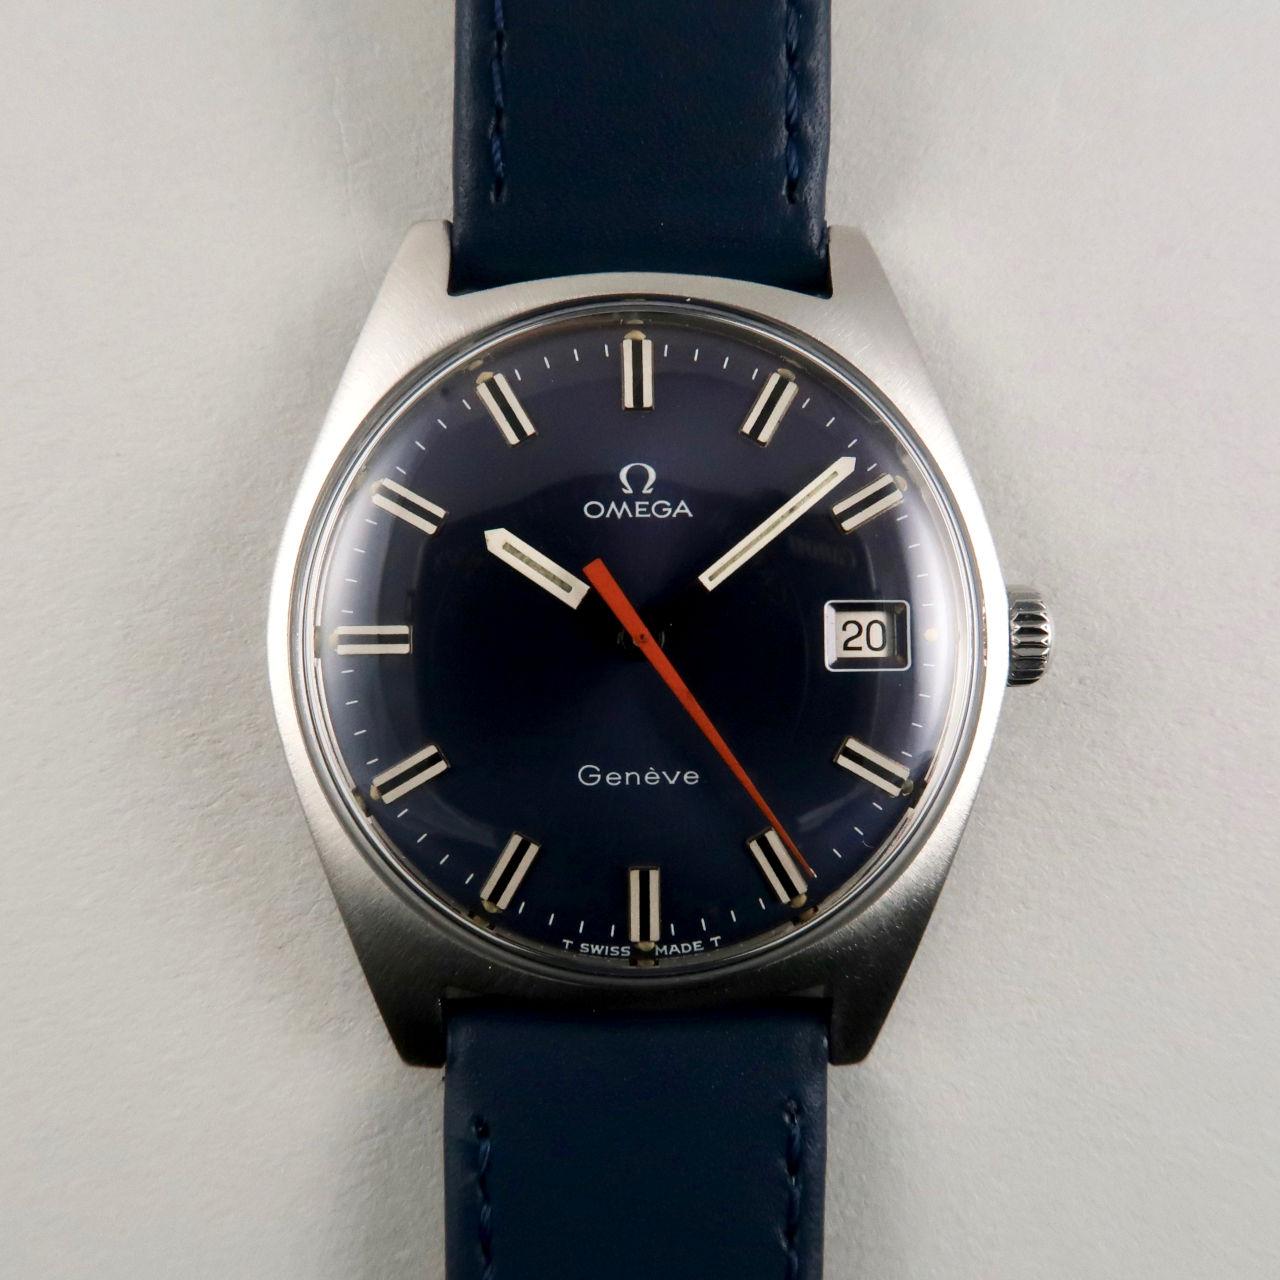 Omega Genève Ref. 136.041 steel vintage wristwatch, circa 1968